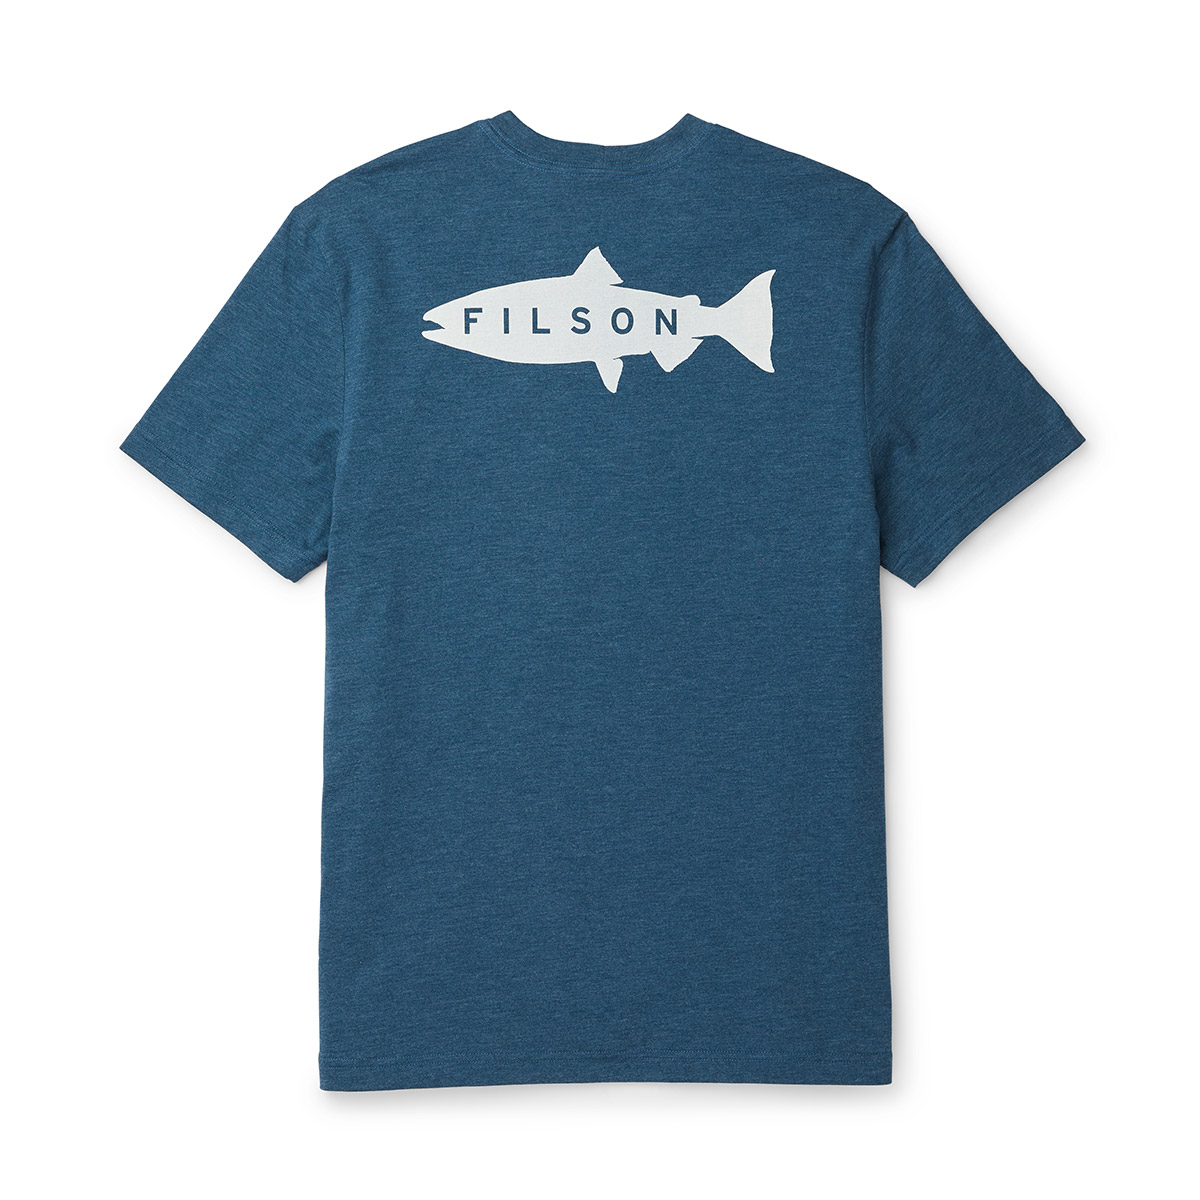 Filson Buckshot T-Shirt Blue Wing Teal, hoogwaardig T-shirt met UPF 50+ zonwering